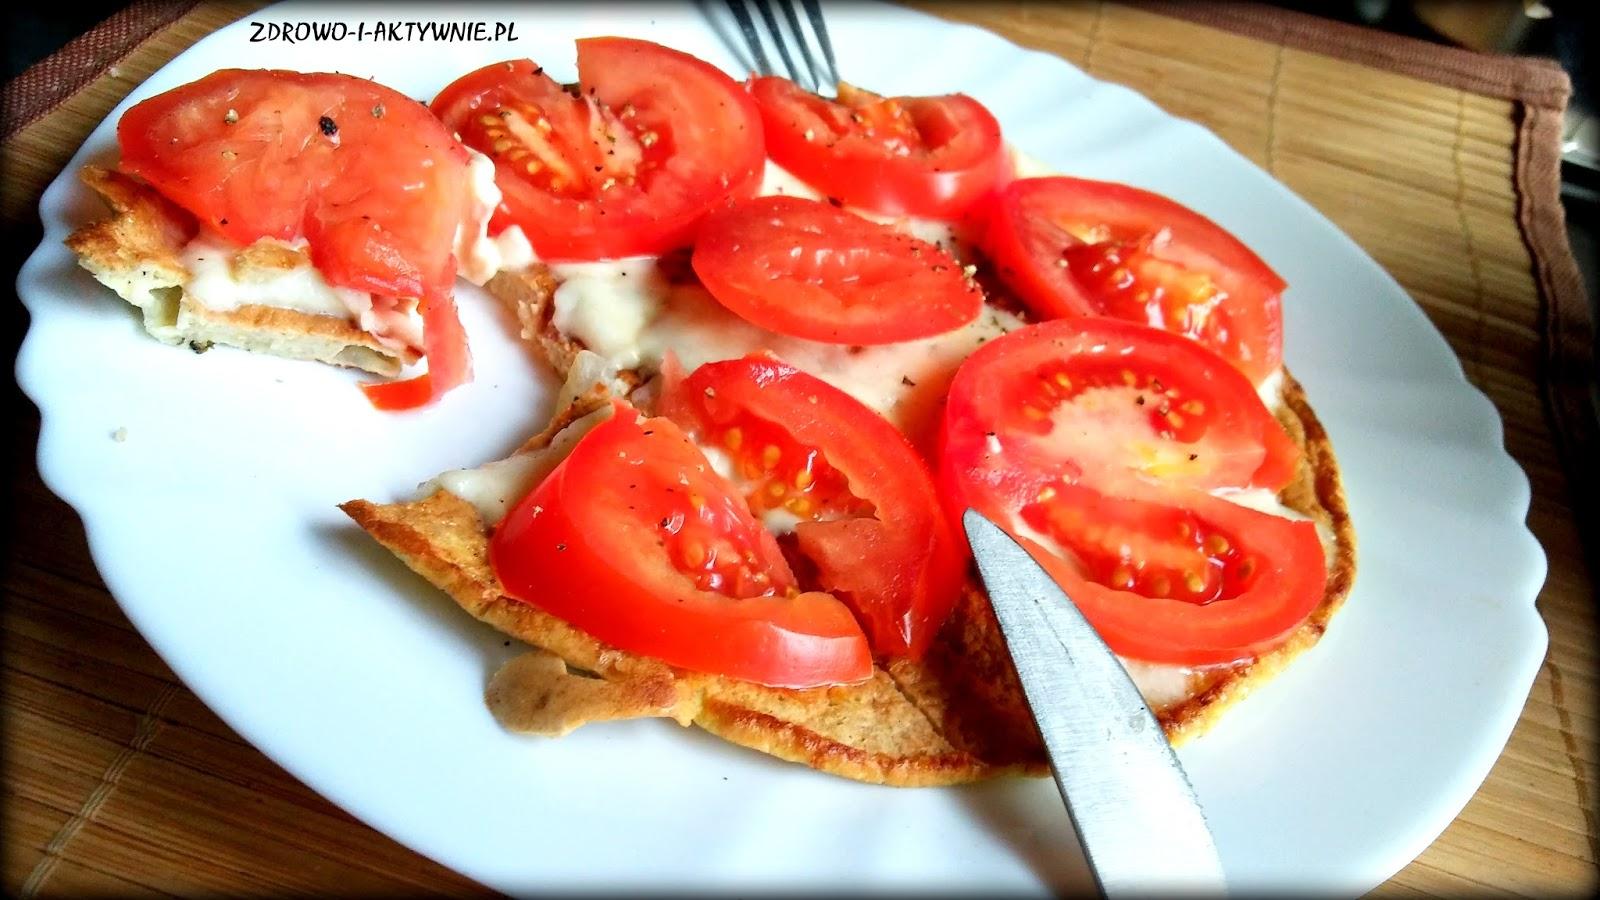 Owsiany omlet z mozzarellą